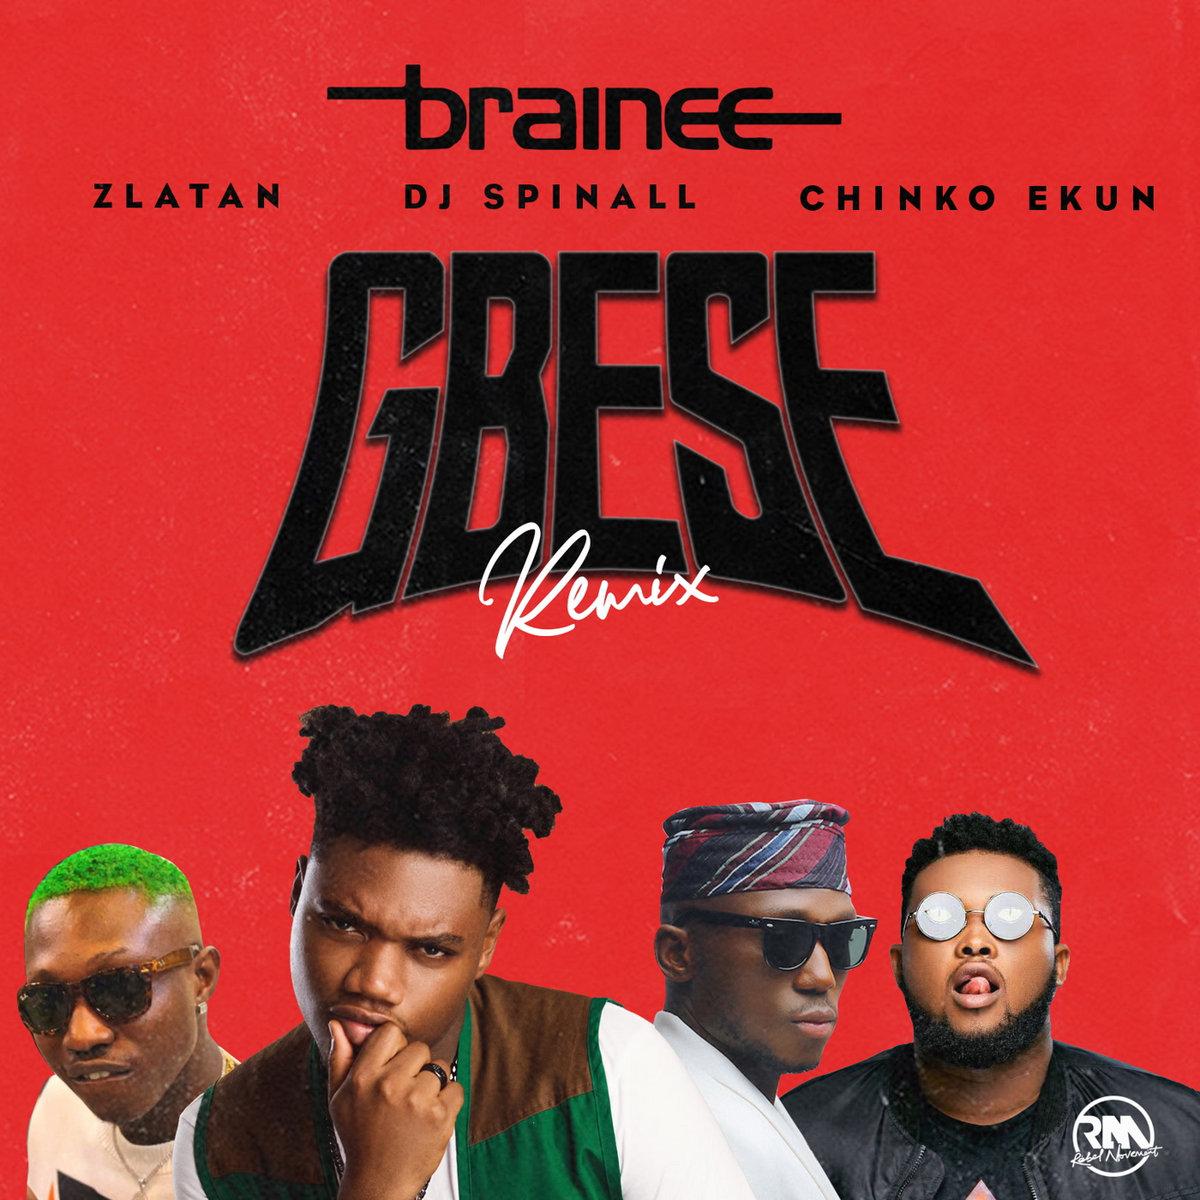 Gbese (Remix) [feat  Zlatan, DJ Spinall & Chinko Ekun